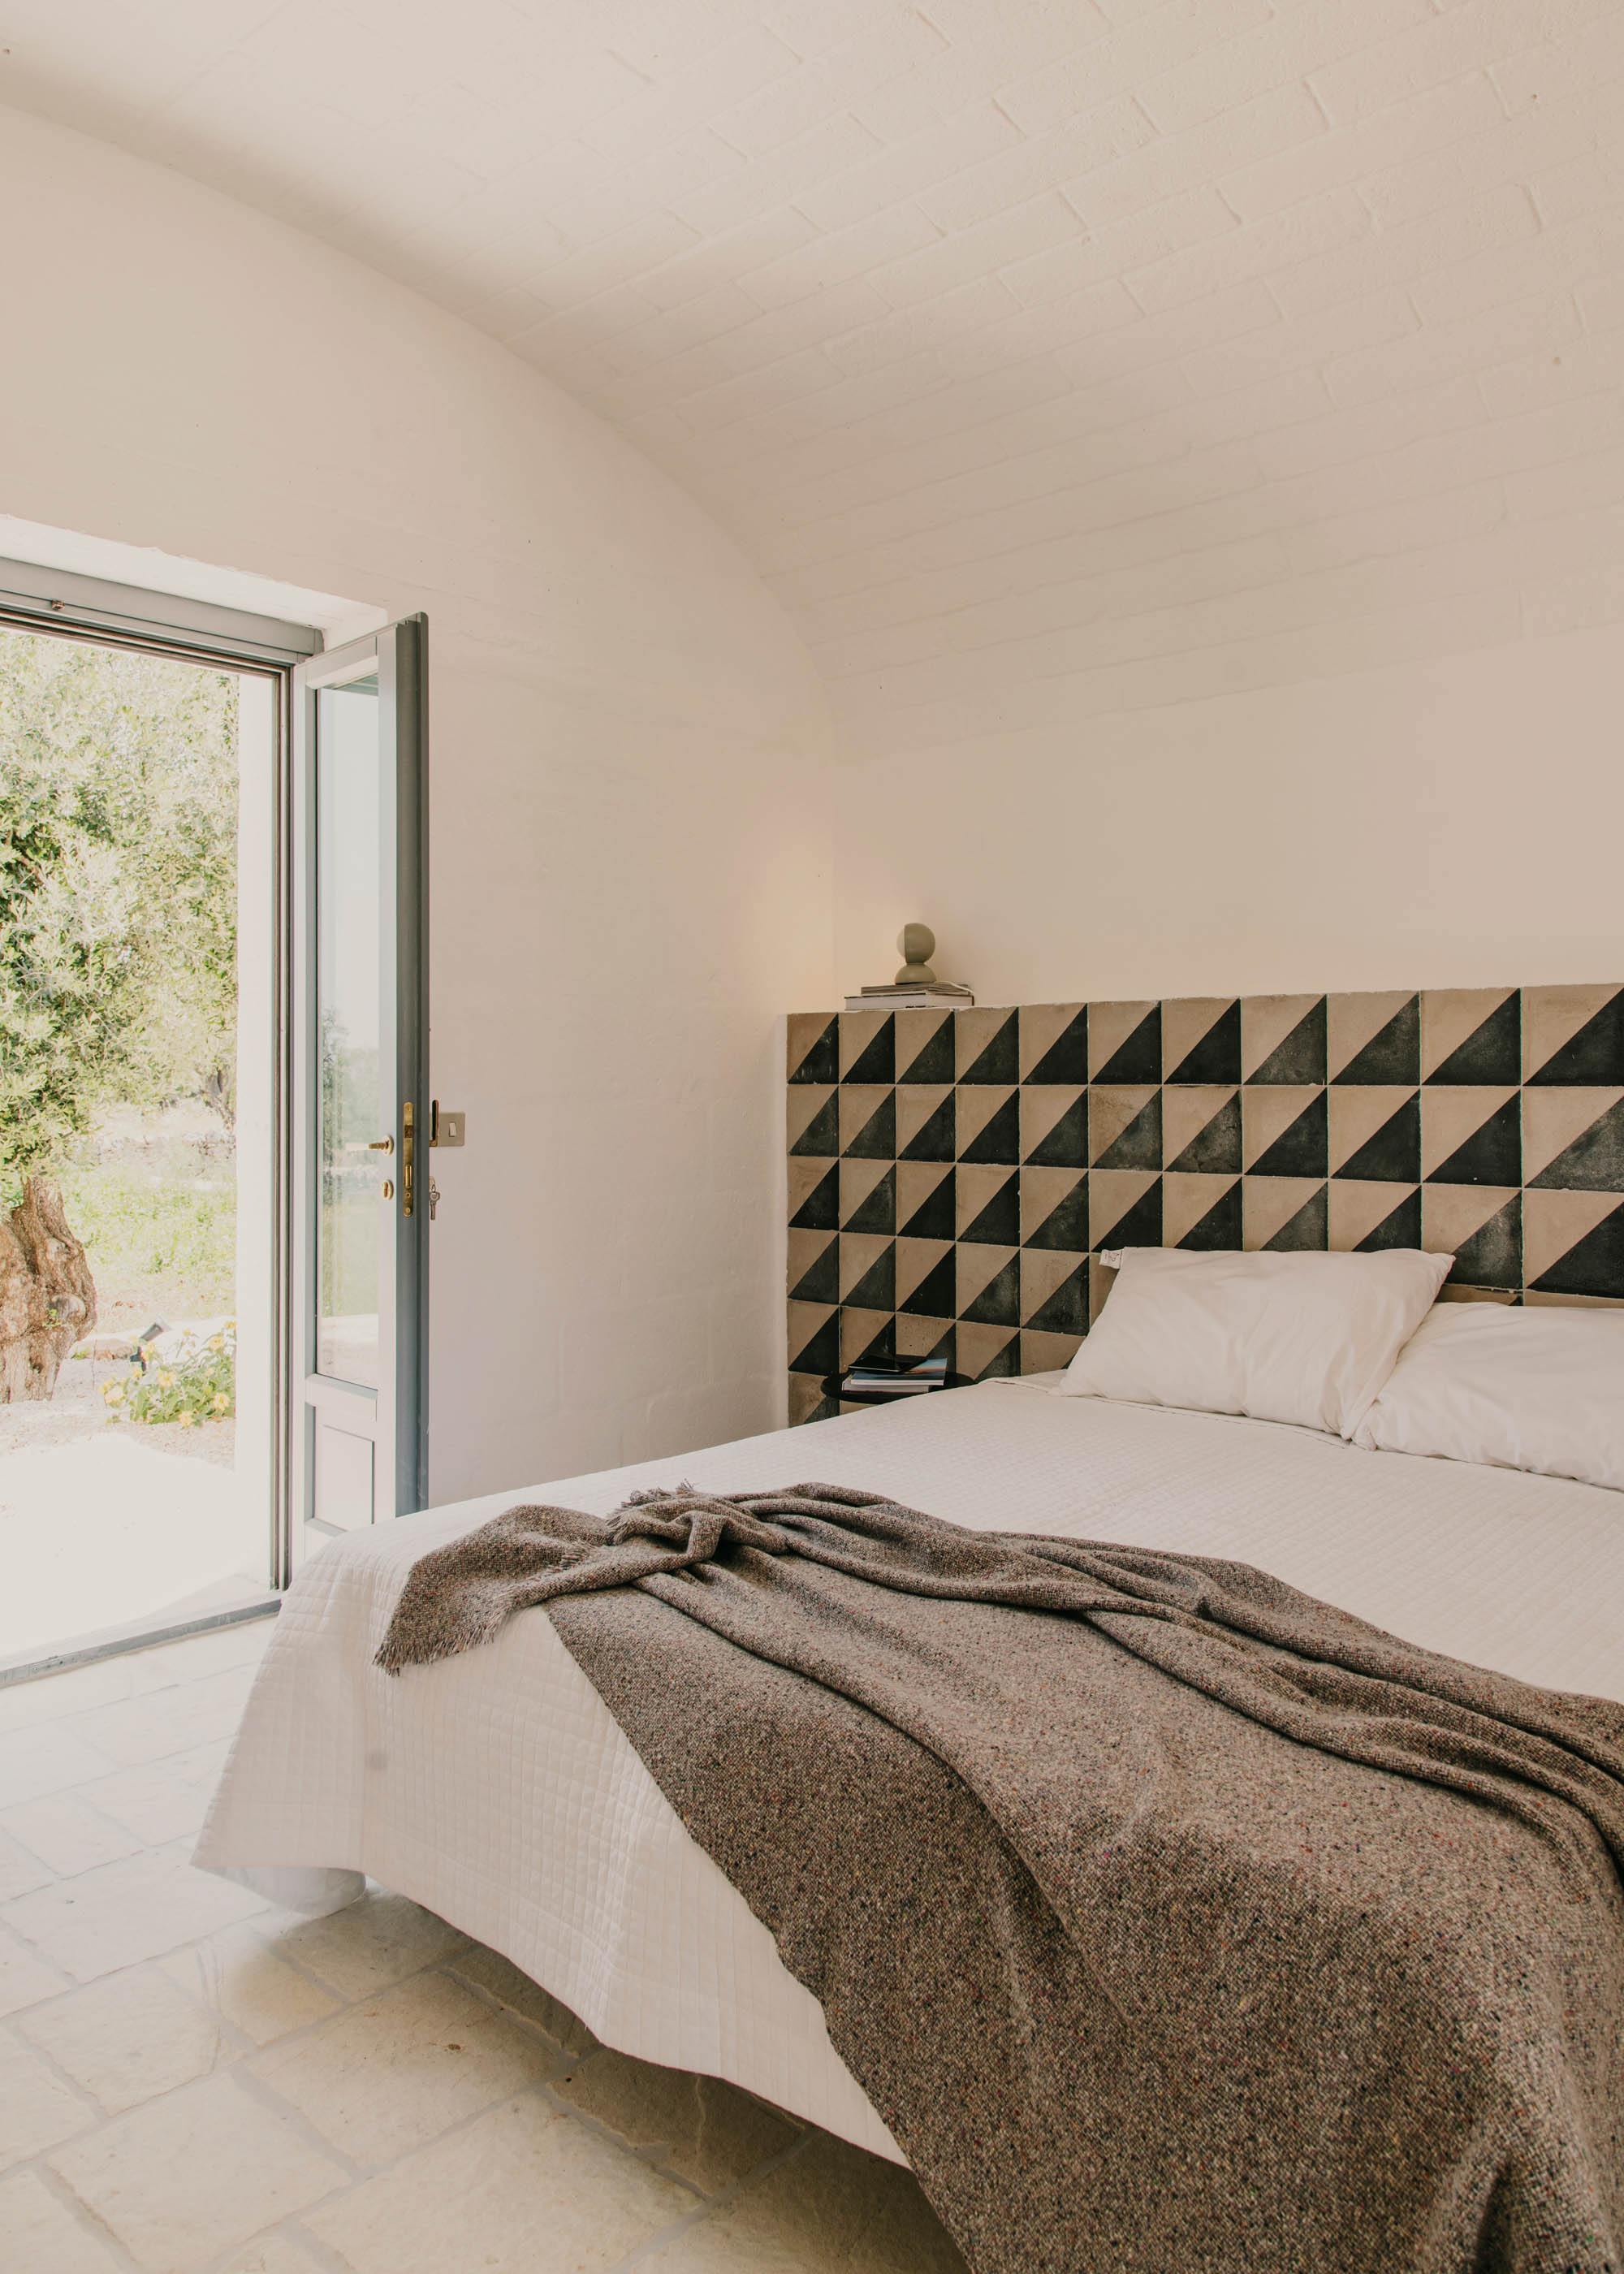 #editorial #italy #puglia #masseria #morosseta #openhouse #hotels